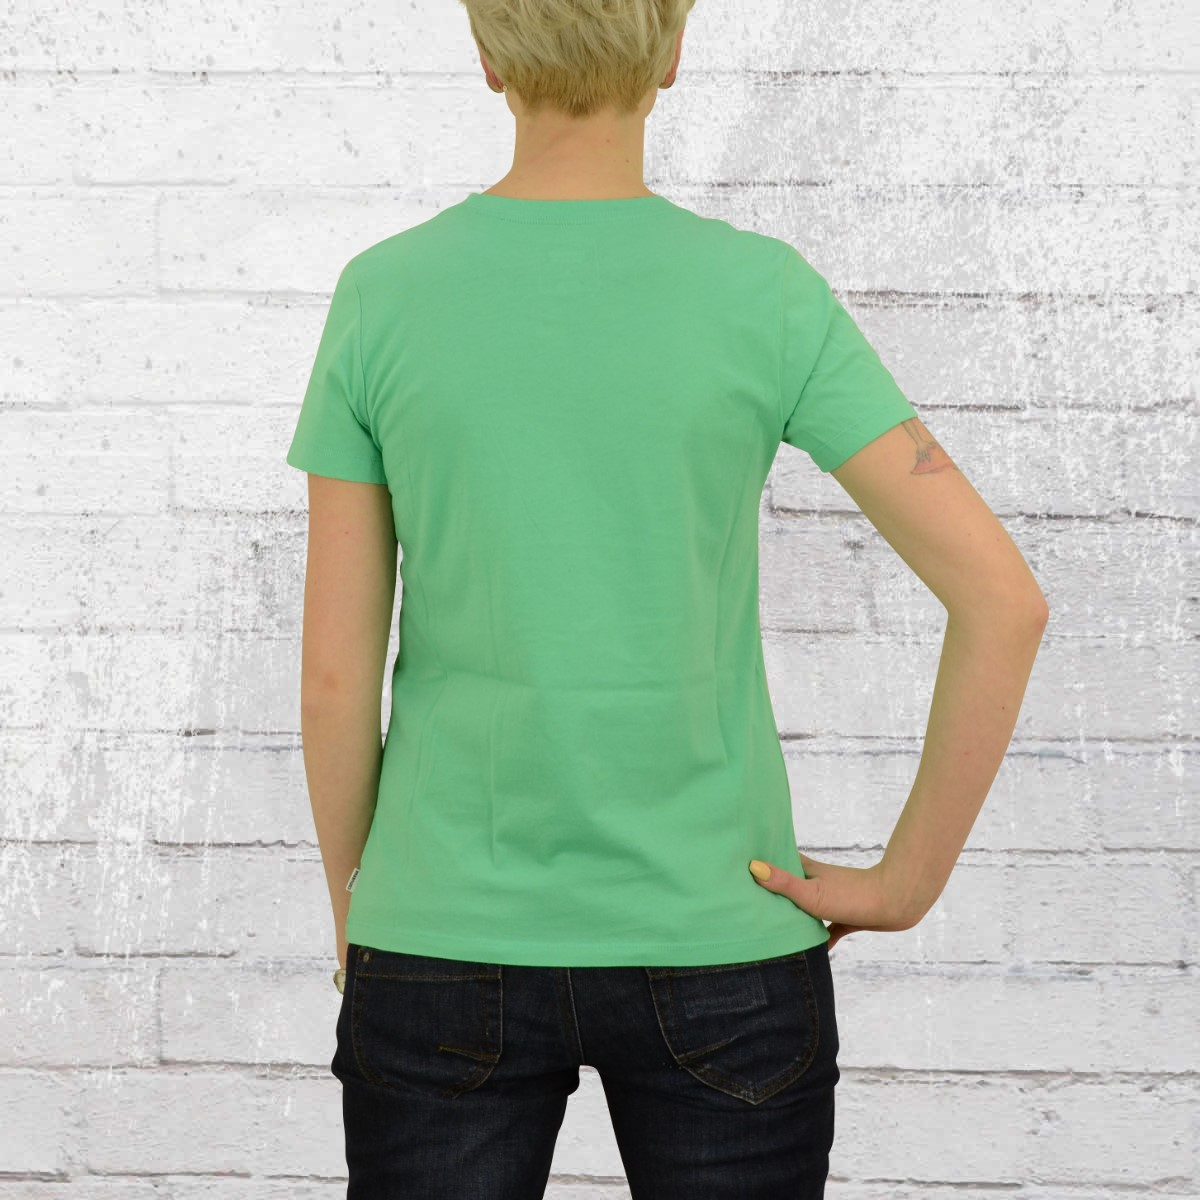 7817f26557f6 Have you seen  Derbe Ladies T-Shirt Seahorse green balbes melange